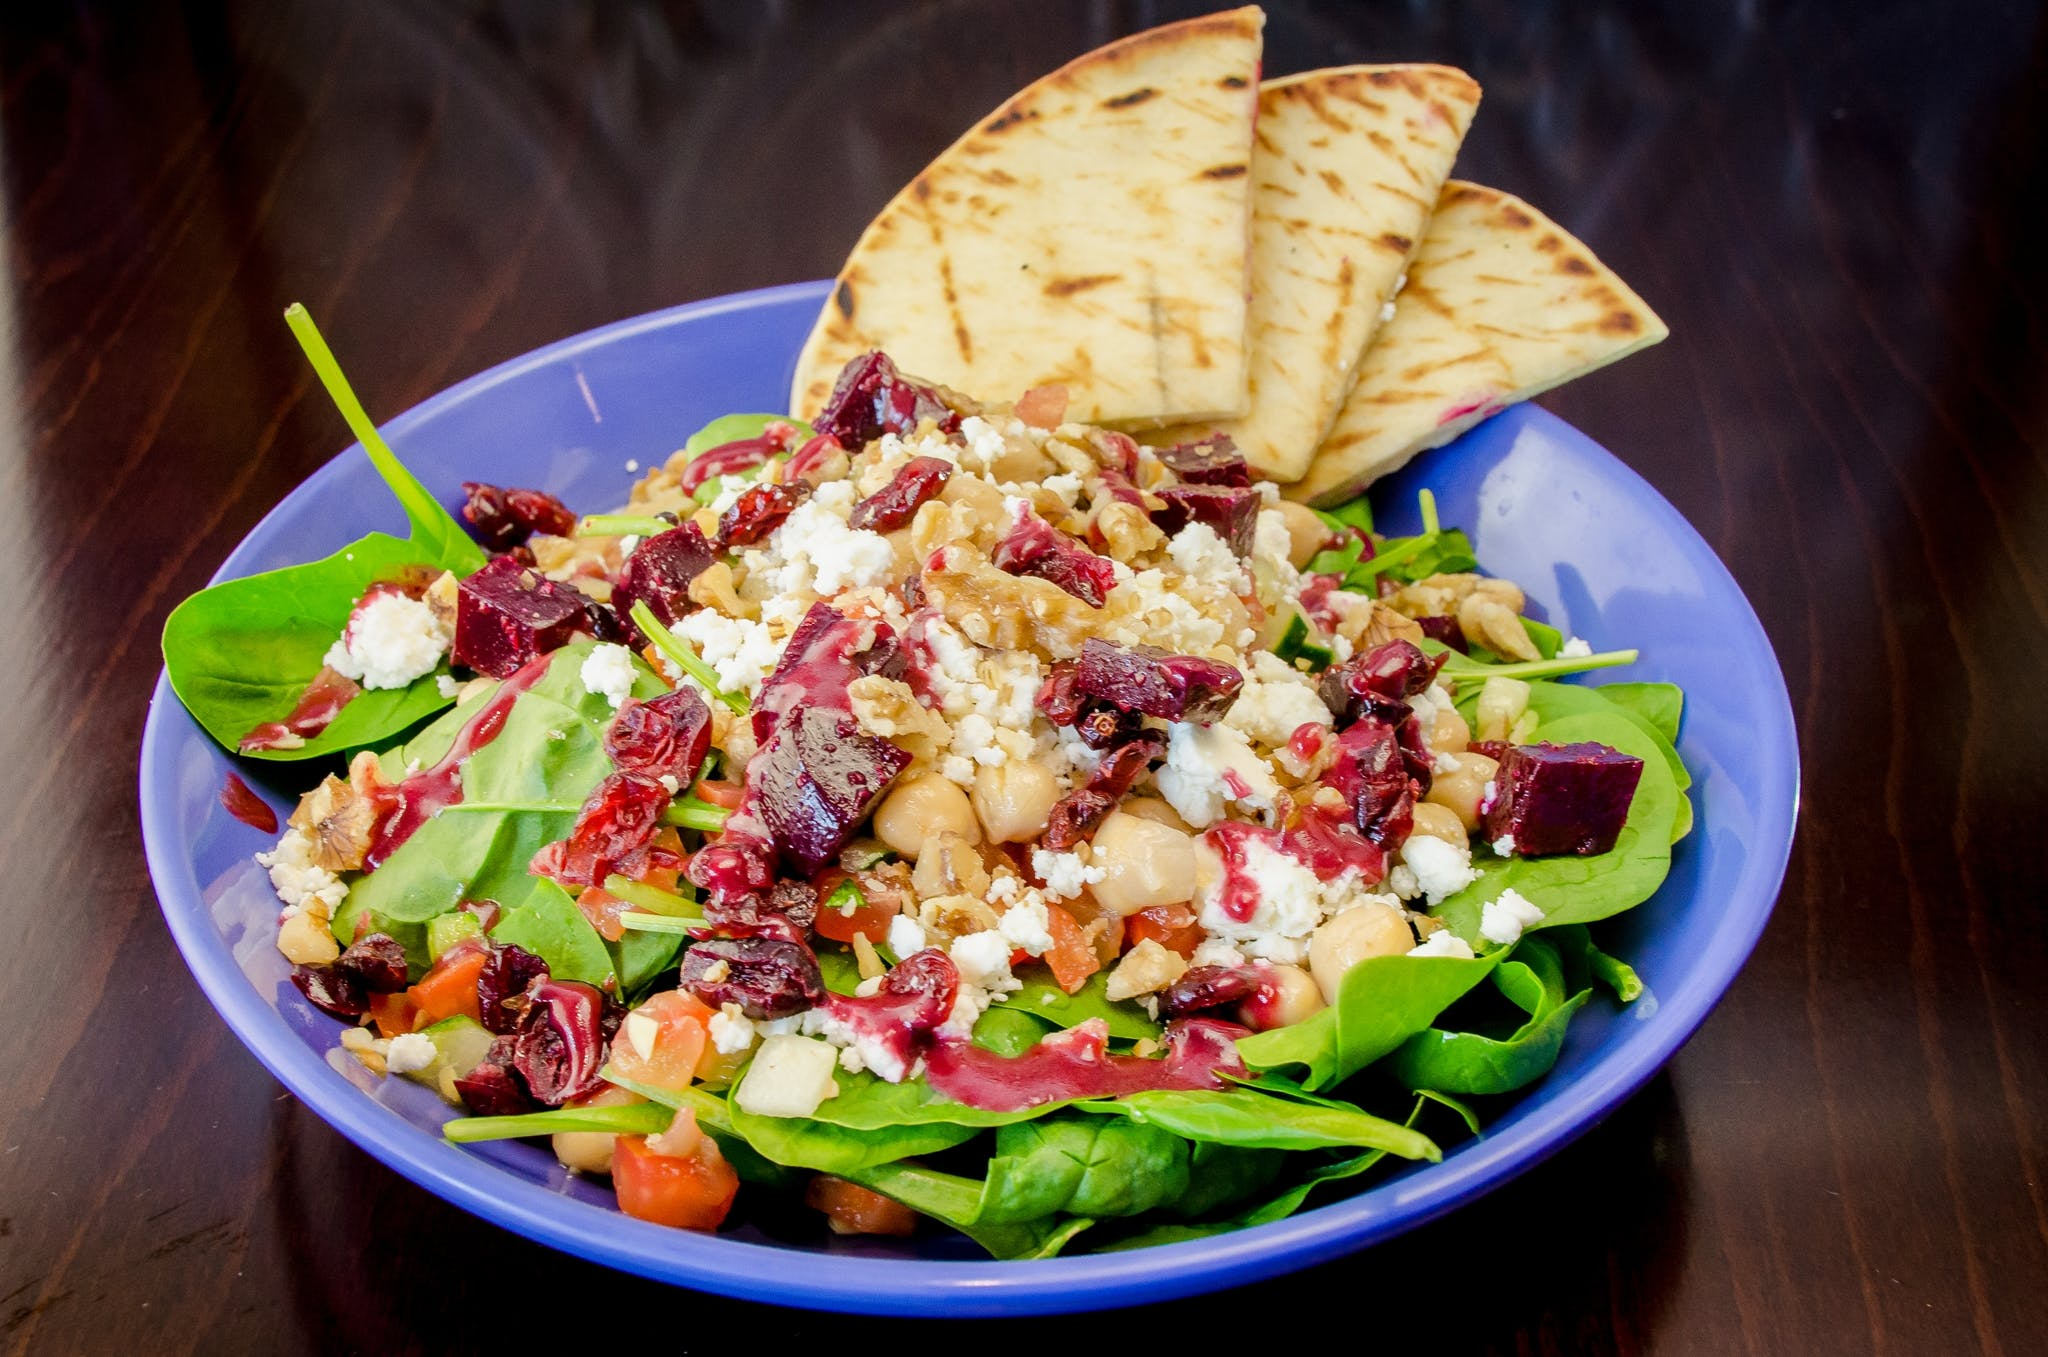 Spinach Salad from Freska Mediterranean Grill in Middleton, WI